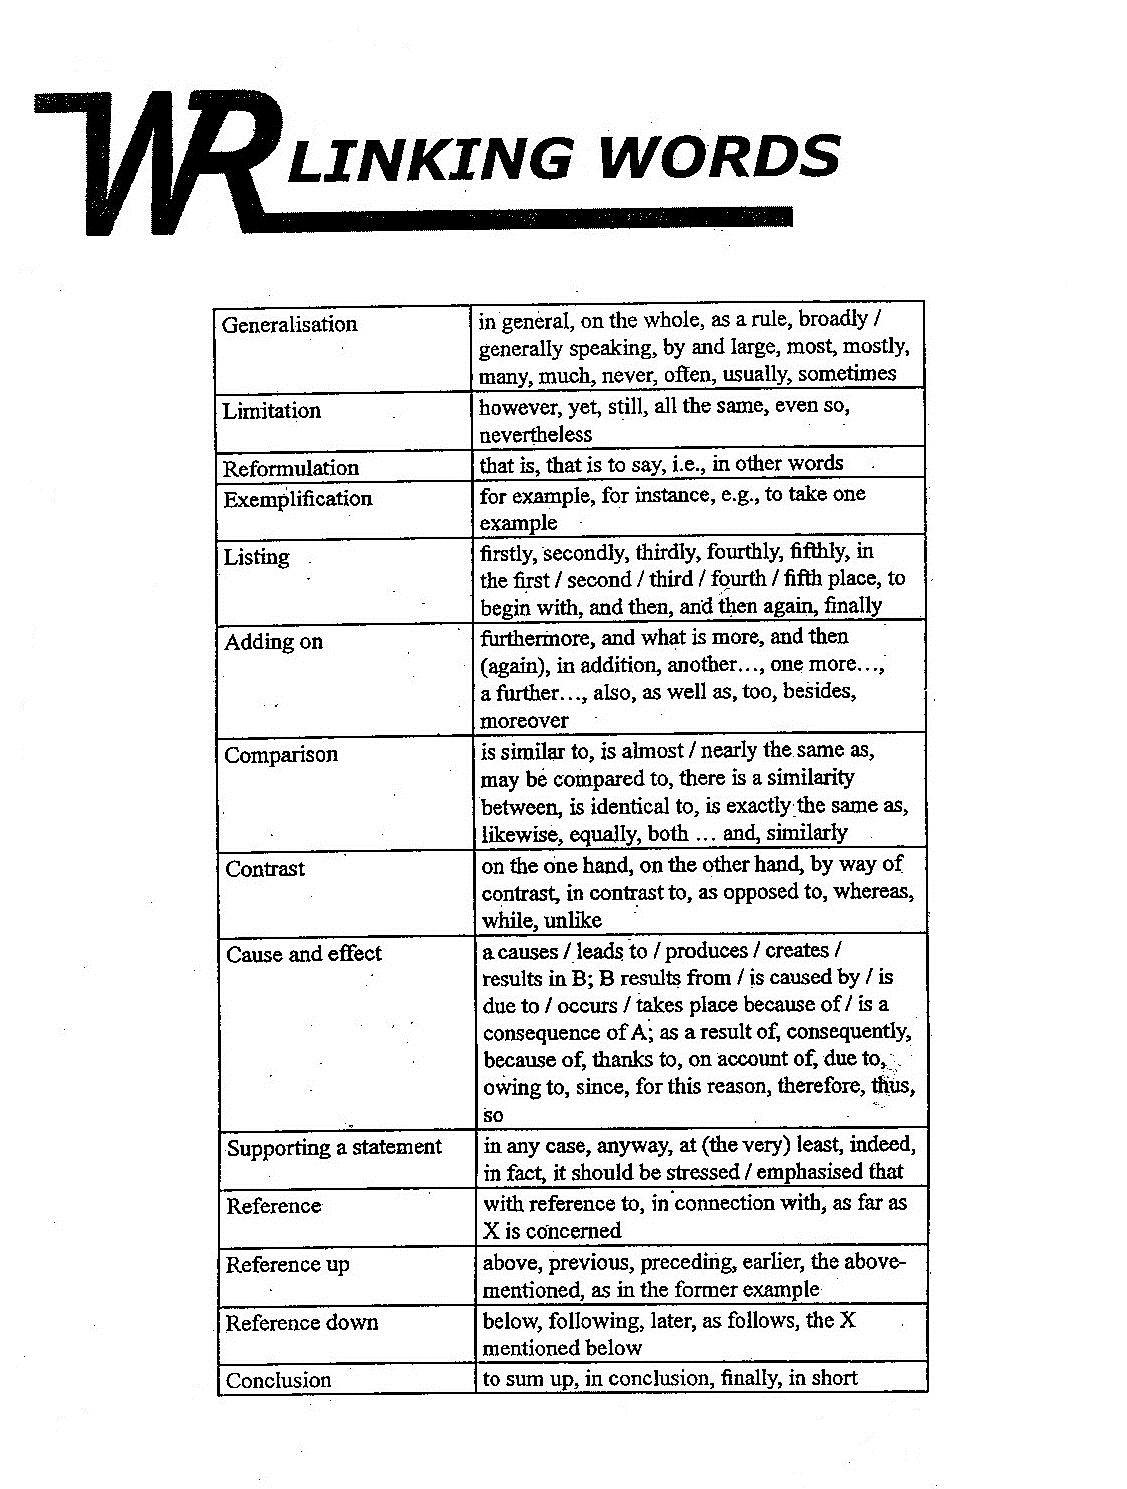 academic linking words